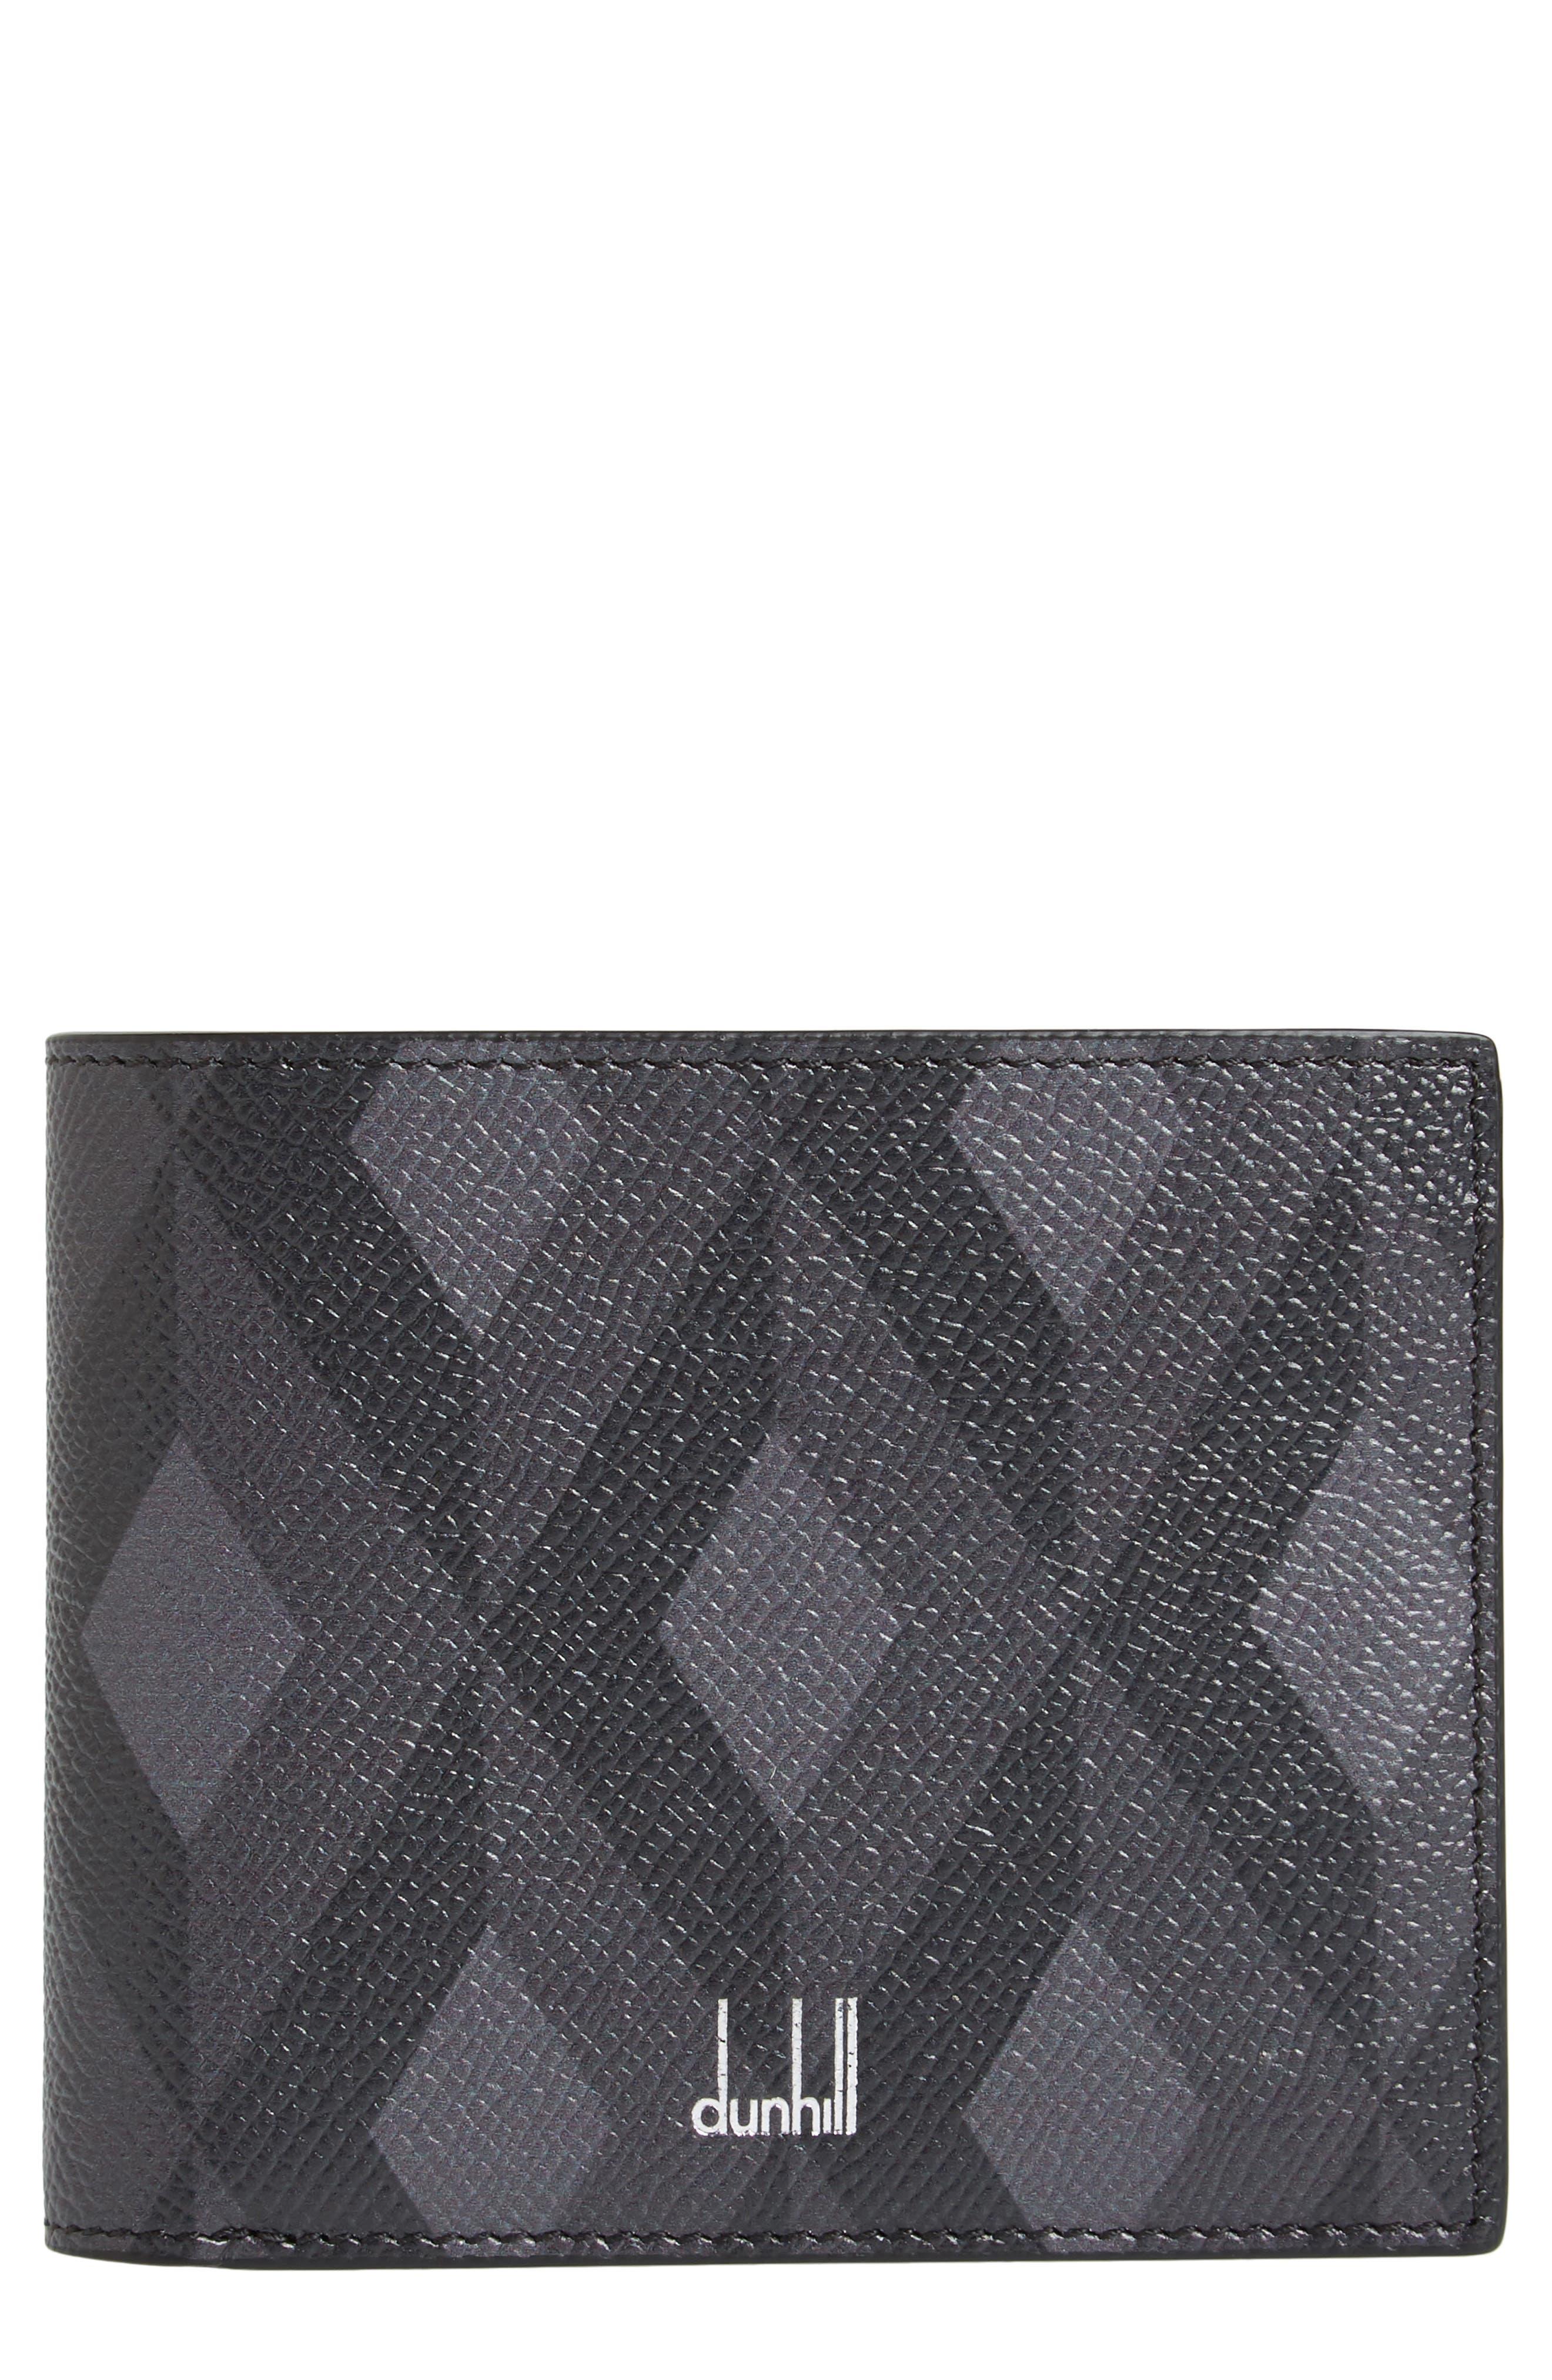 Cadogan Leather Wallet,                             Main thumbnail 1, color,                             020